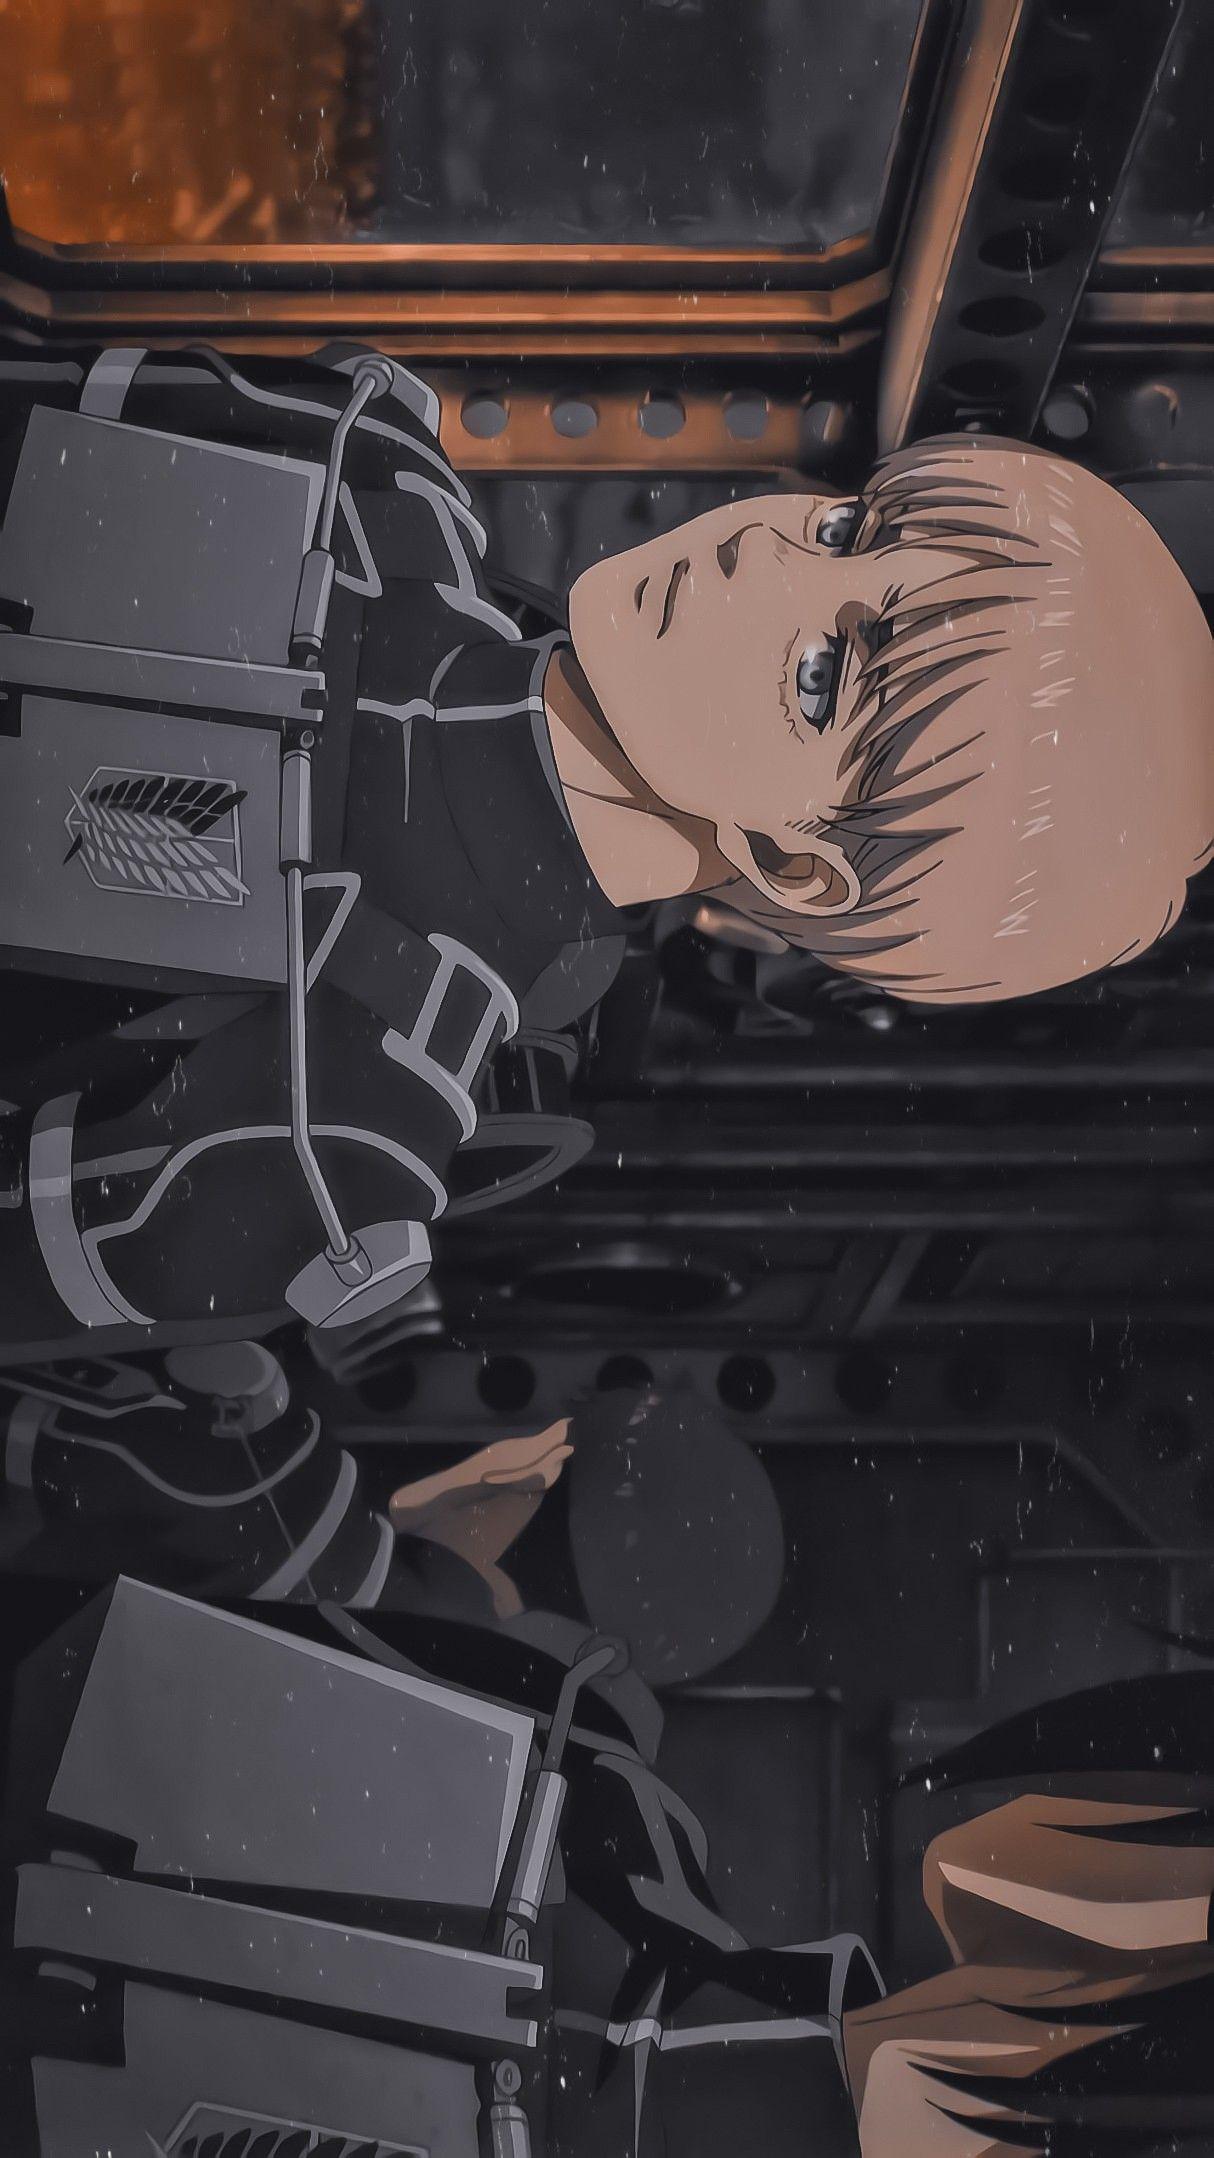 ʜᴛᴛᴘ ʀɪᴠᴀɪʟʟᴇ In 2021 Attack On Titan Anime Bloodborne Art Anime Cat Boy